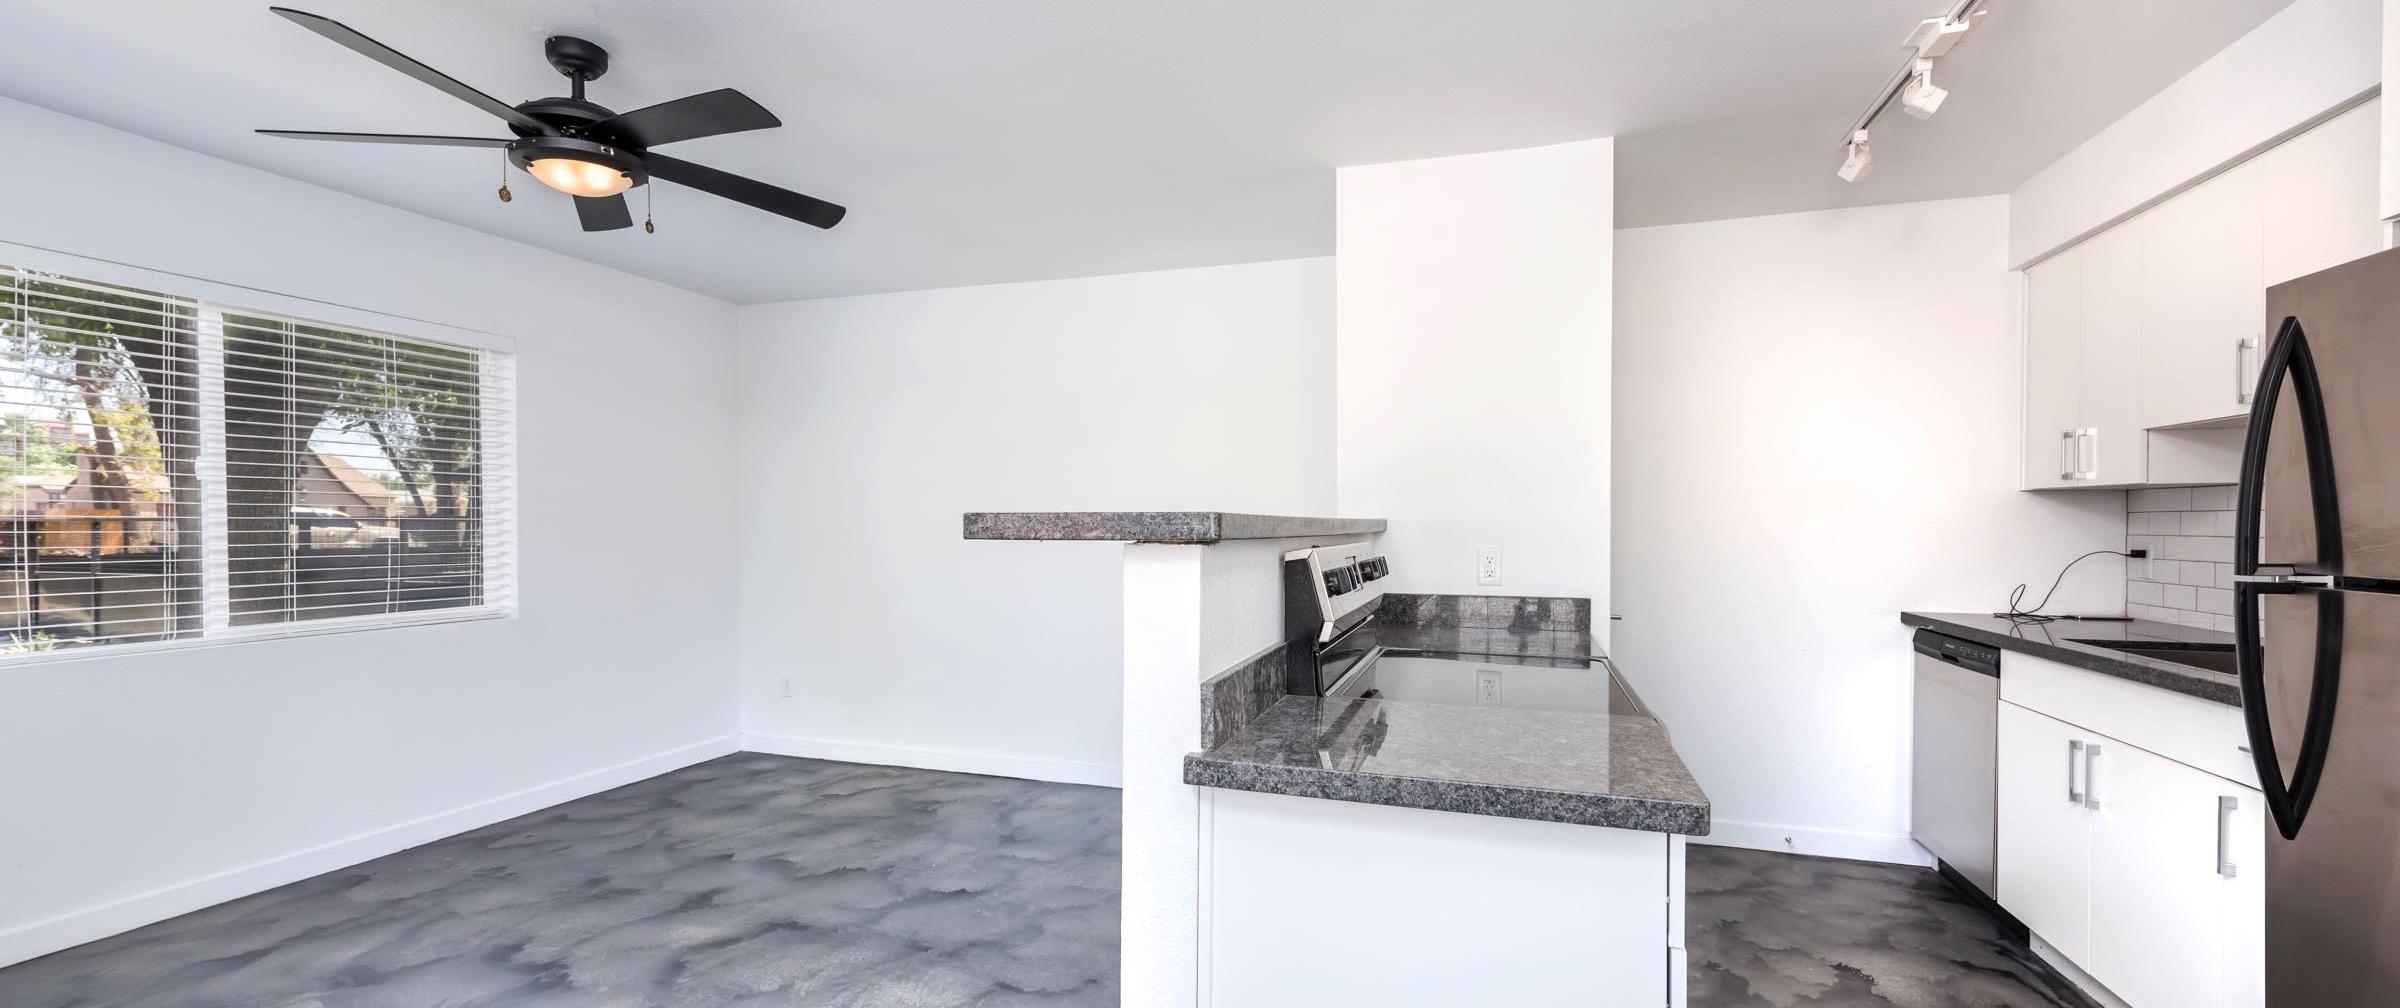 243 W Turney Ave, Phoenix, AZ 85013 | Midtown Phoenix Apartments For Rent